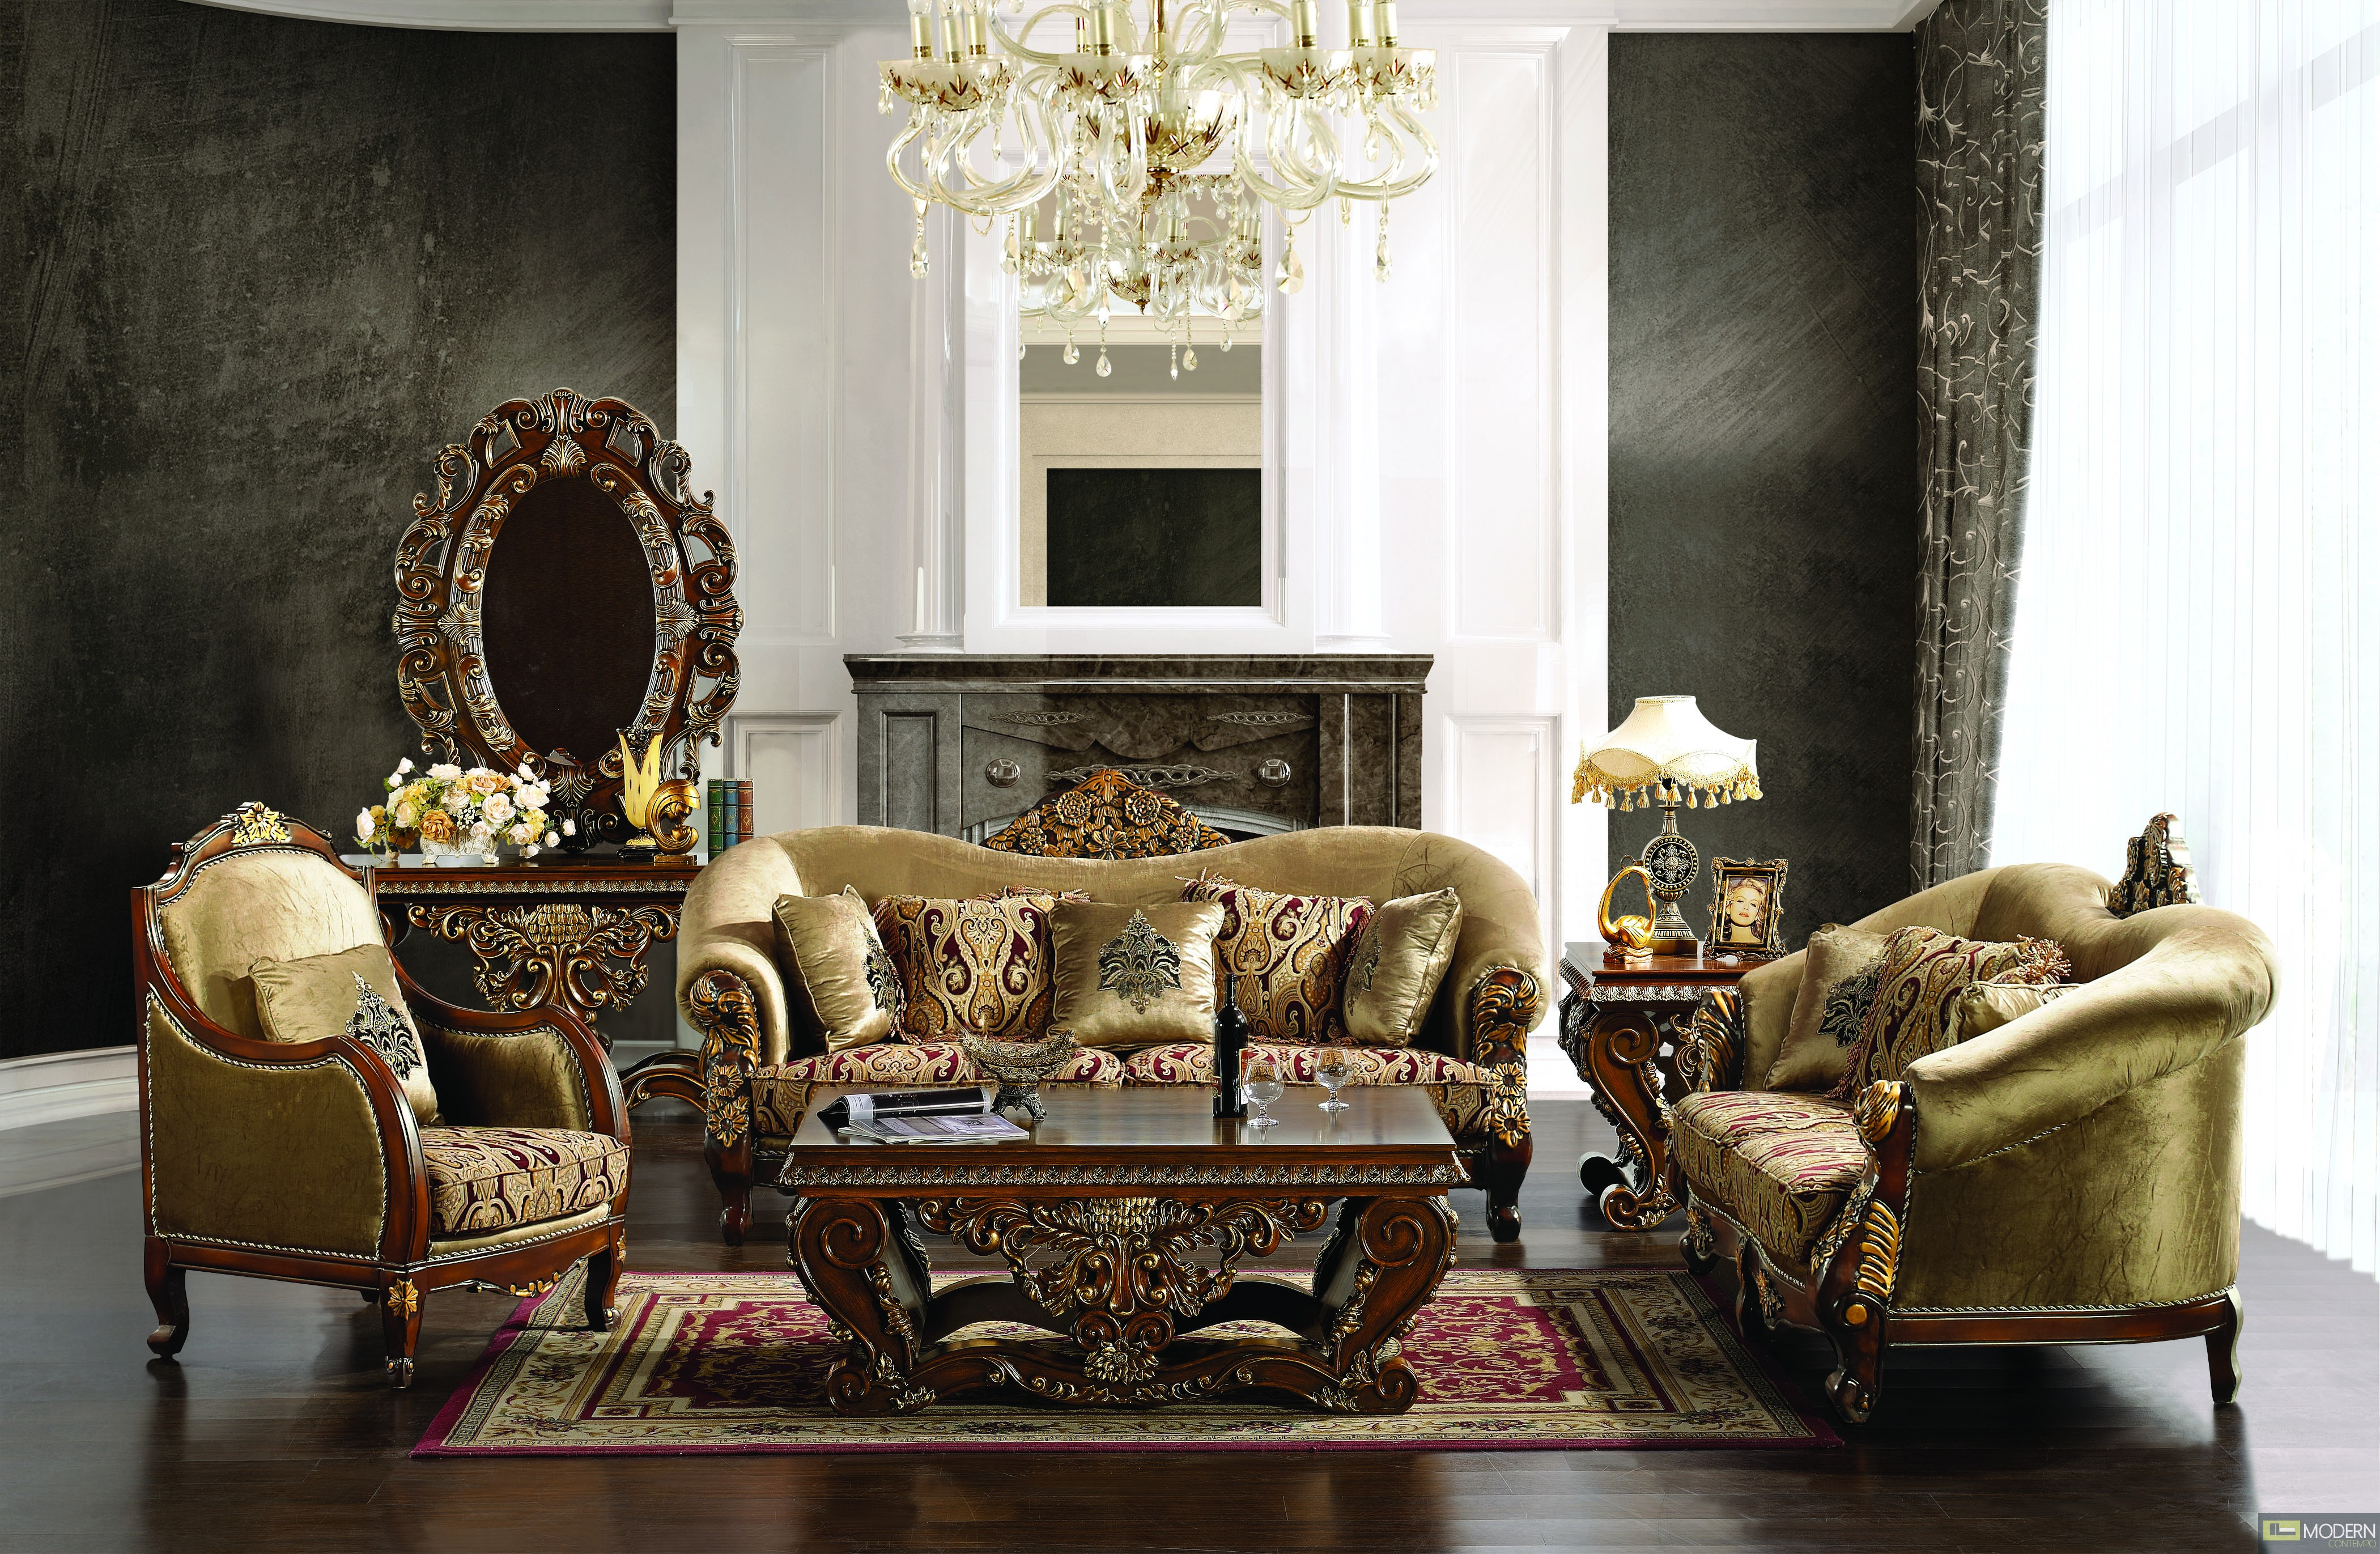 Luxury Sofa Love Seat  Chair 3 Piece Traditional Living Room Set MCHD379